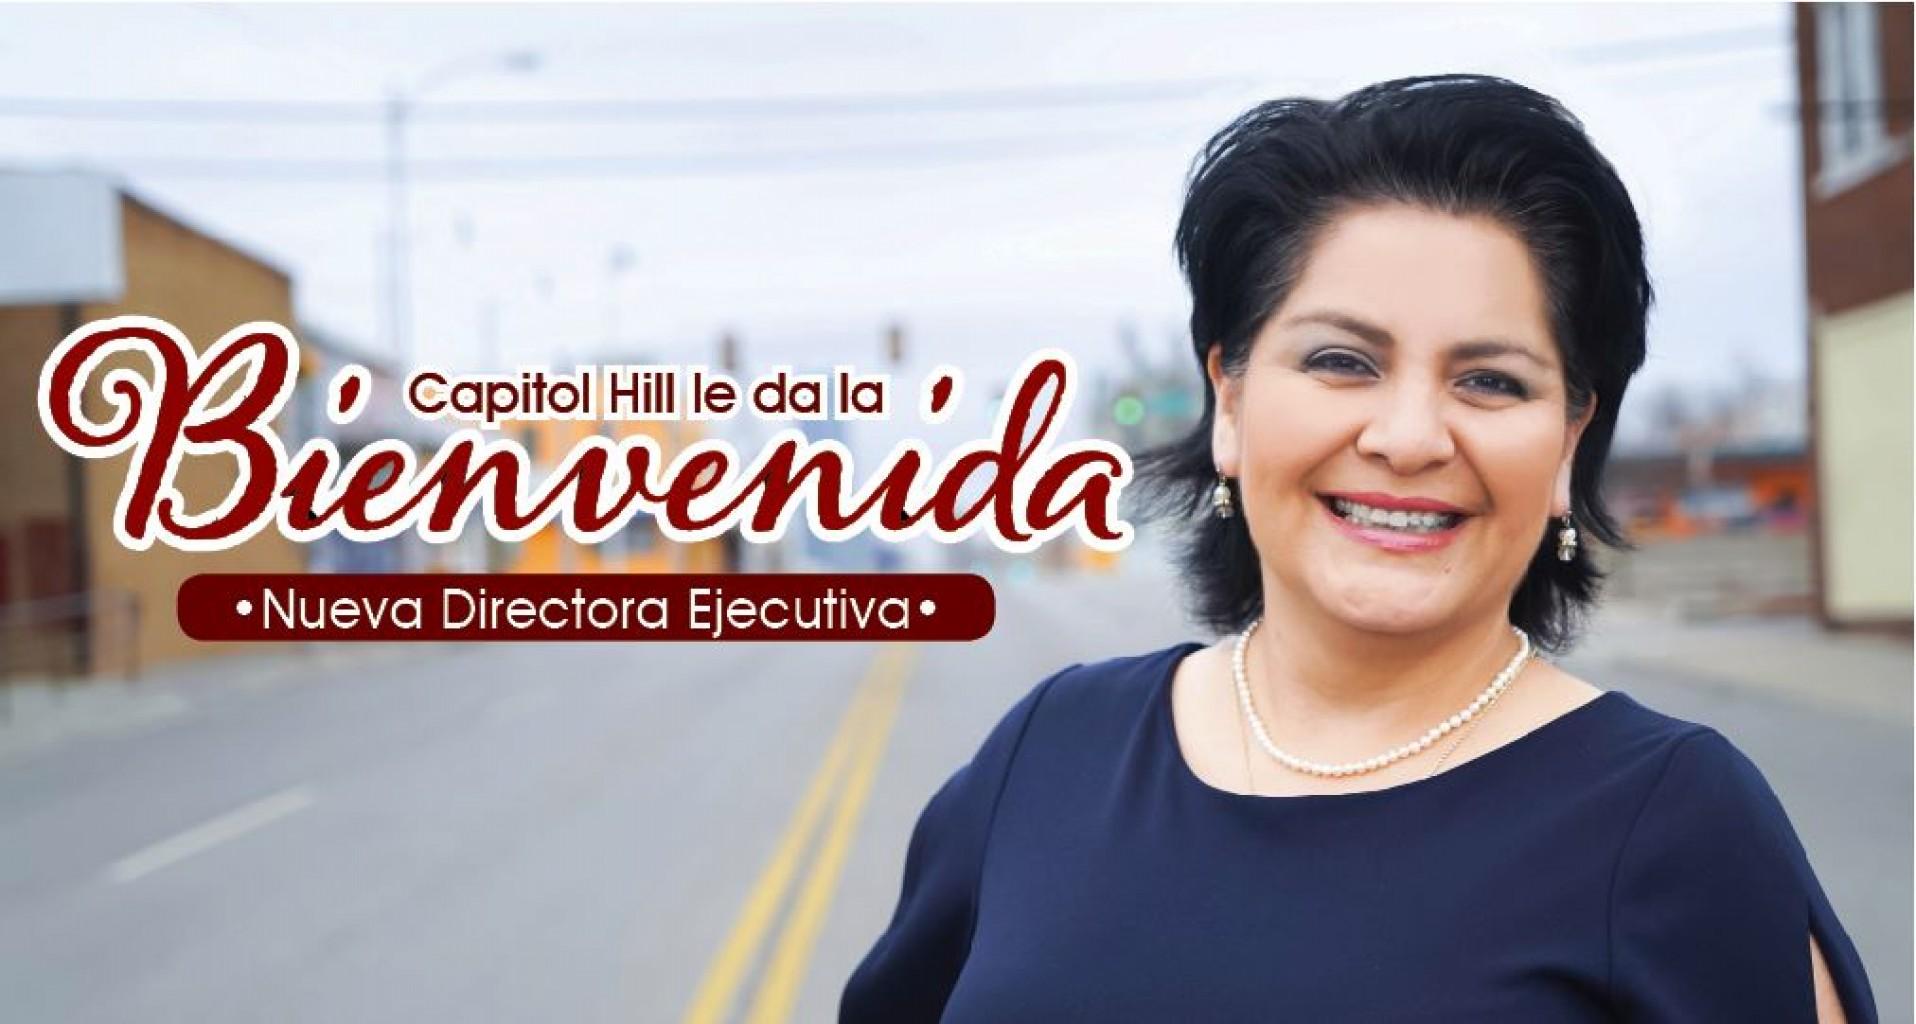 Capitol Hill le da la Bienvenida